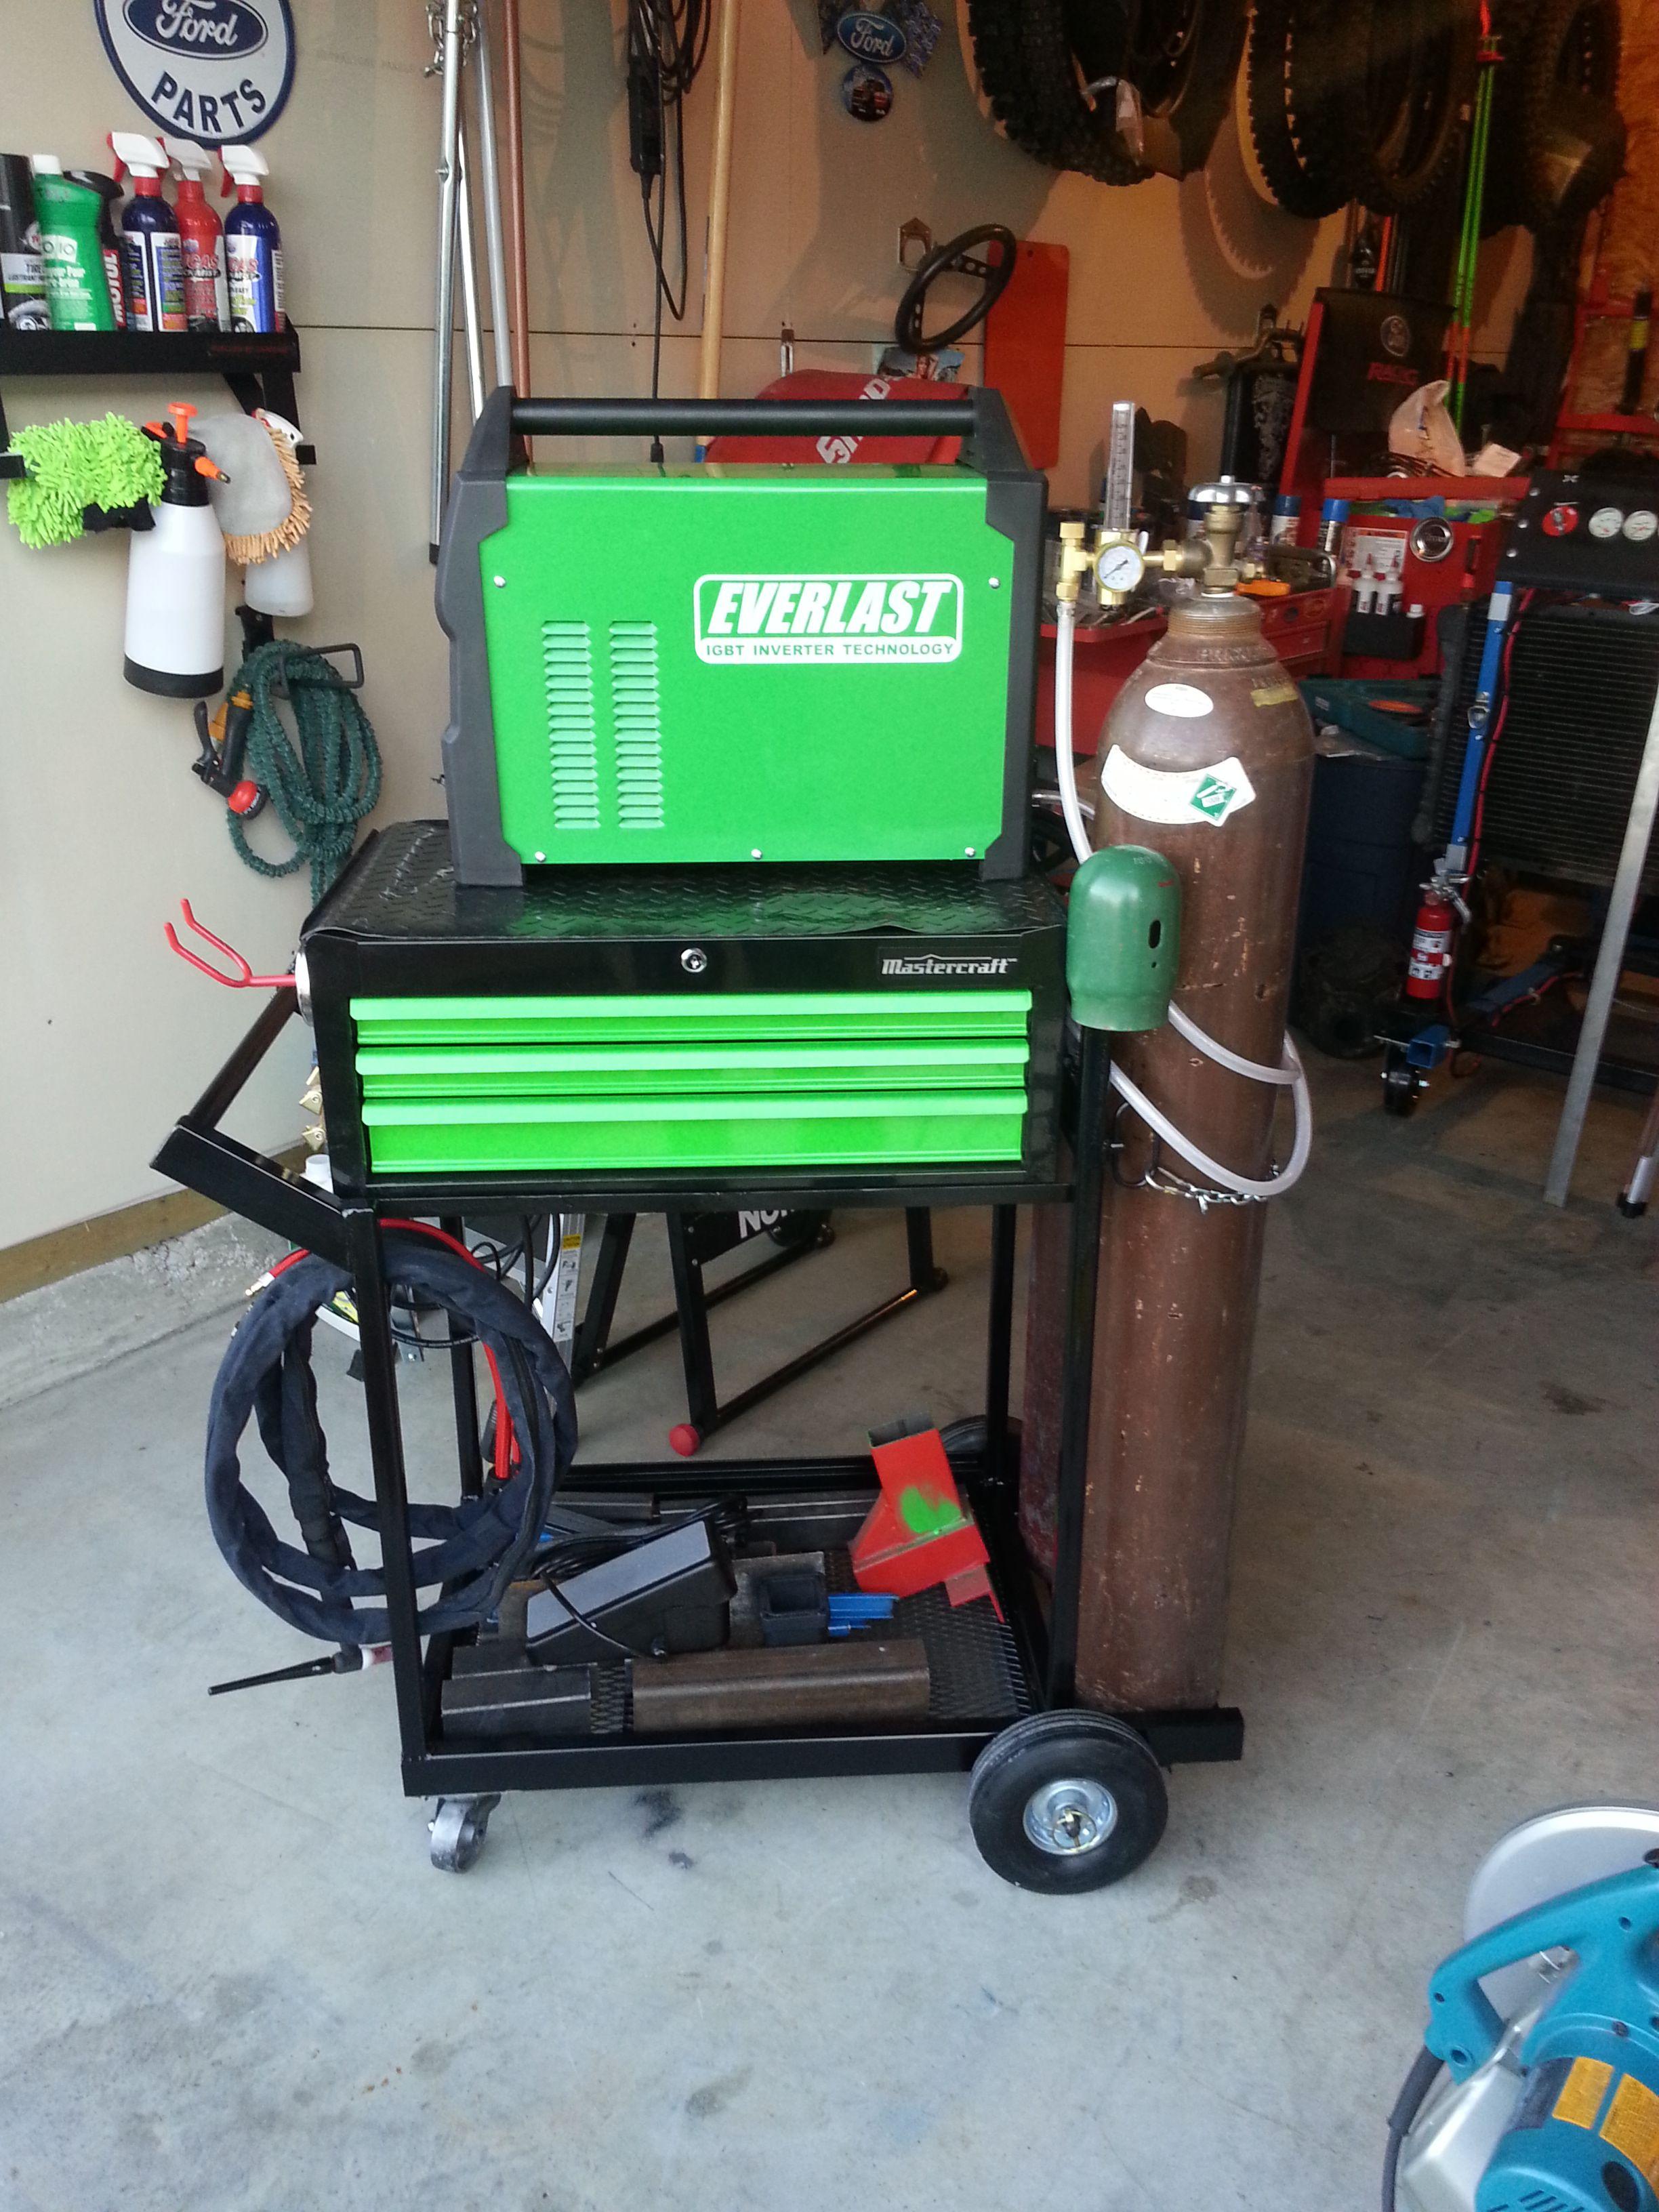 homebuilt welding cart that I built last week. I used